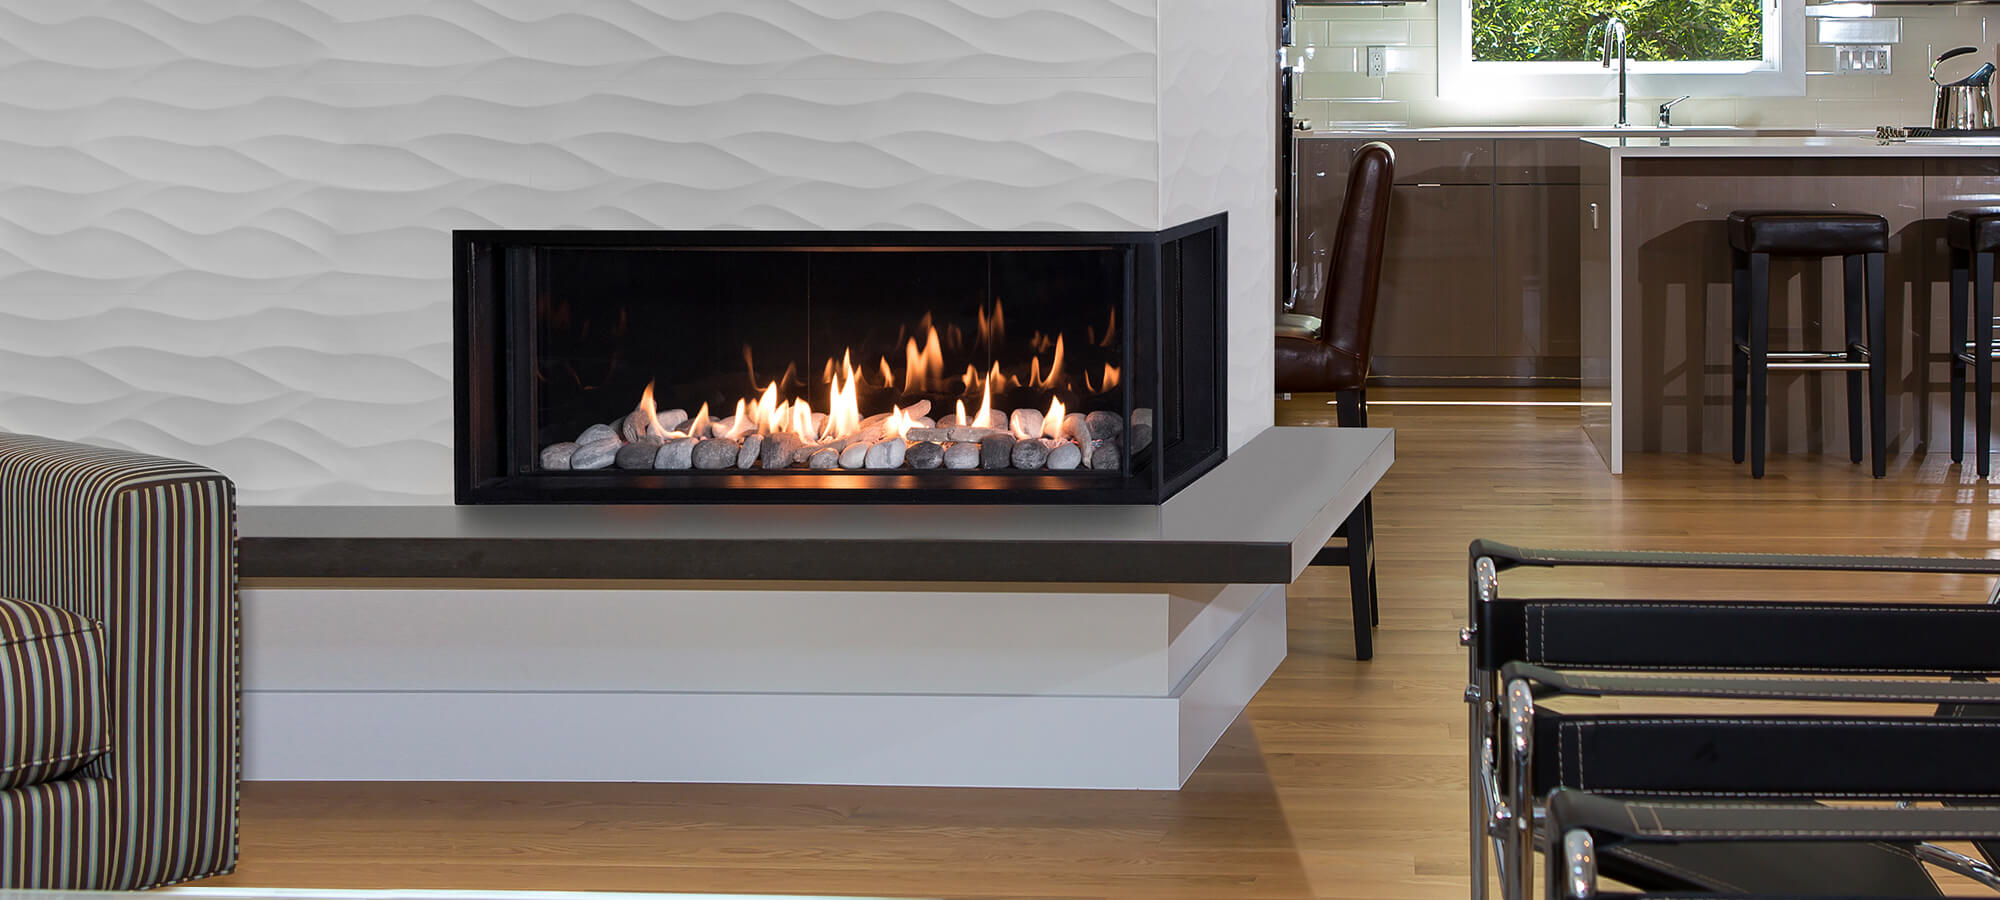 Valor The Original Radiant Gas Fireplace